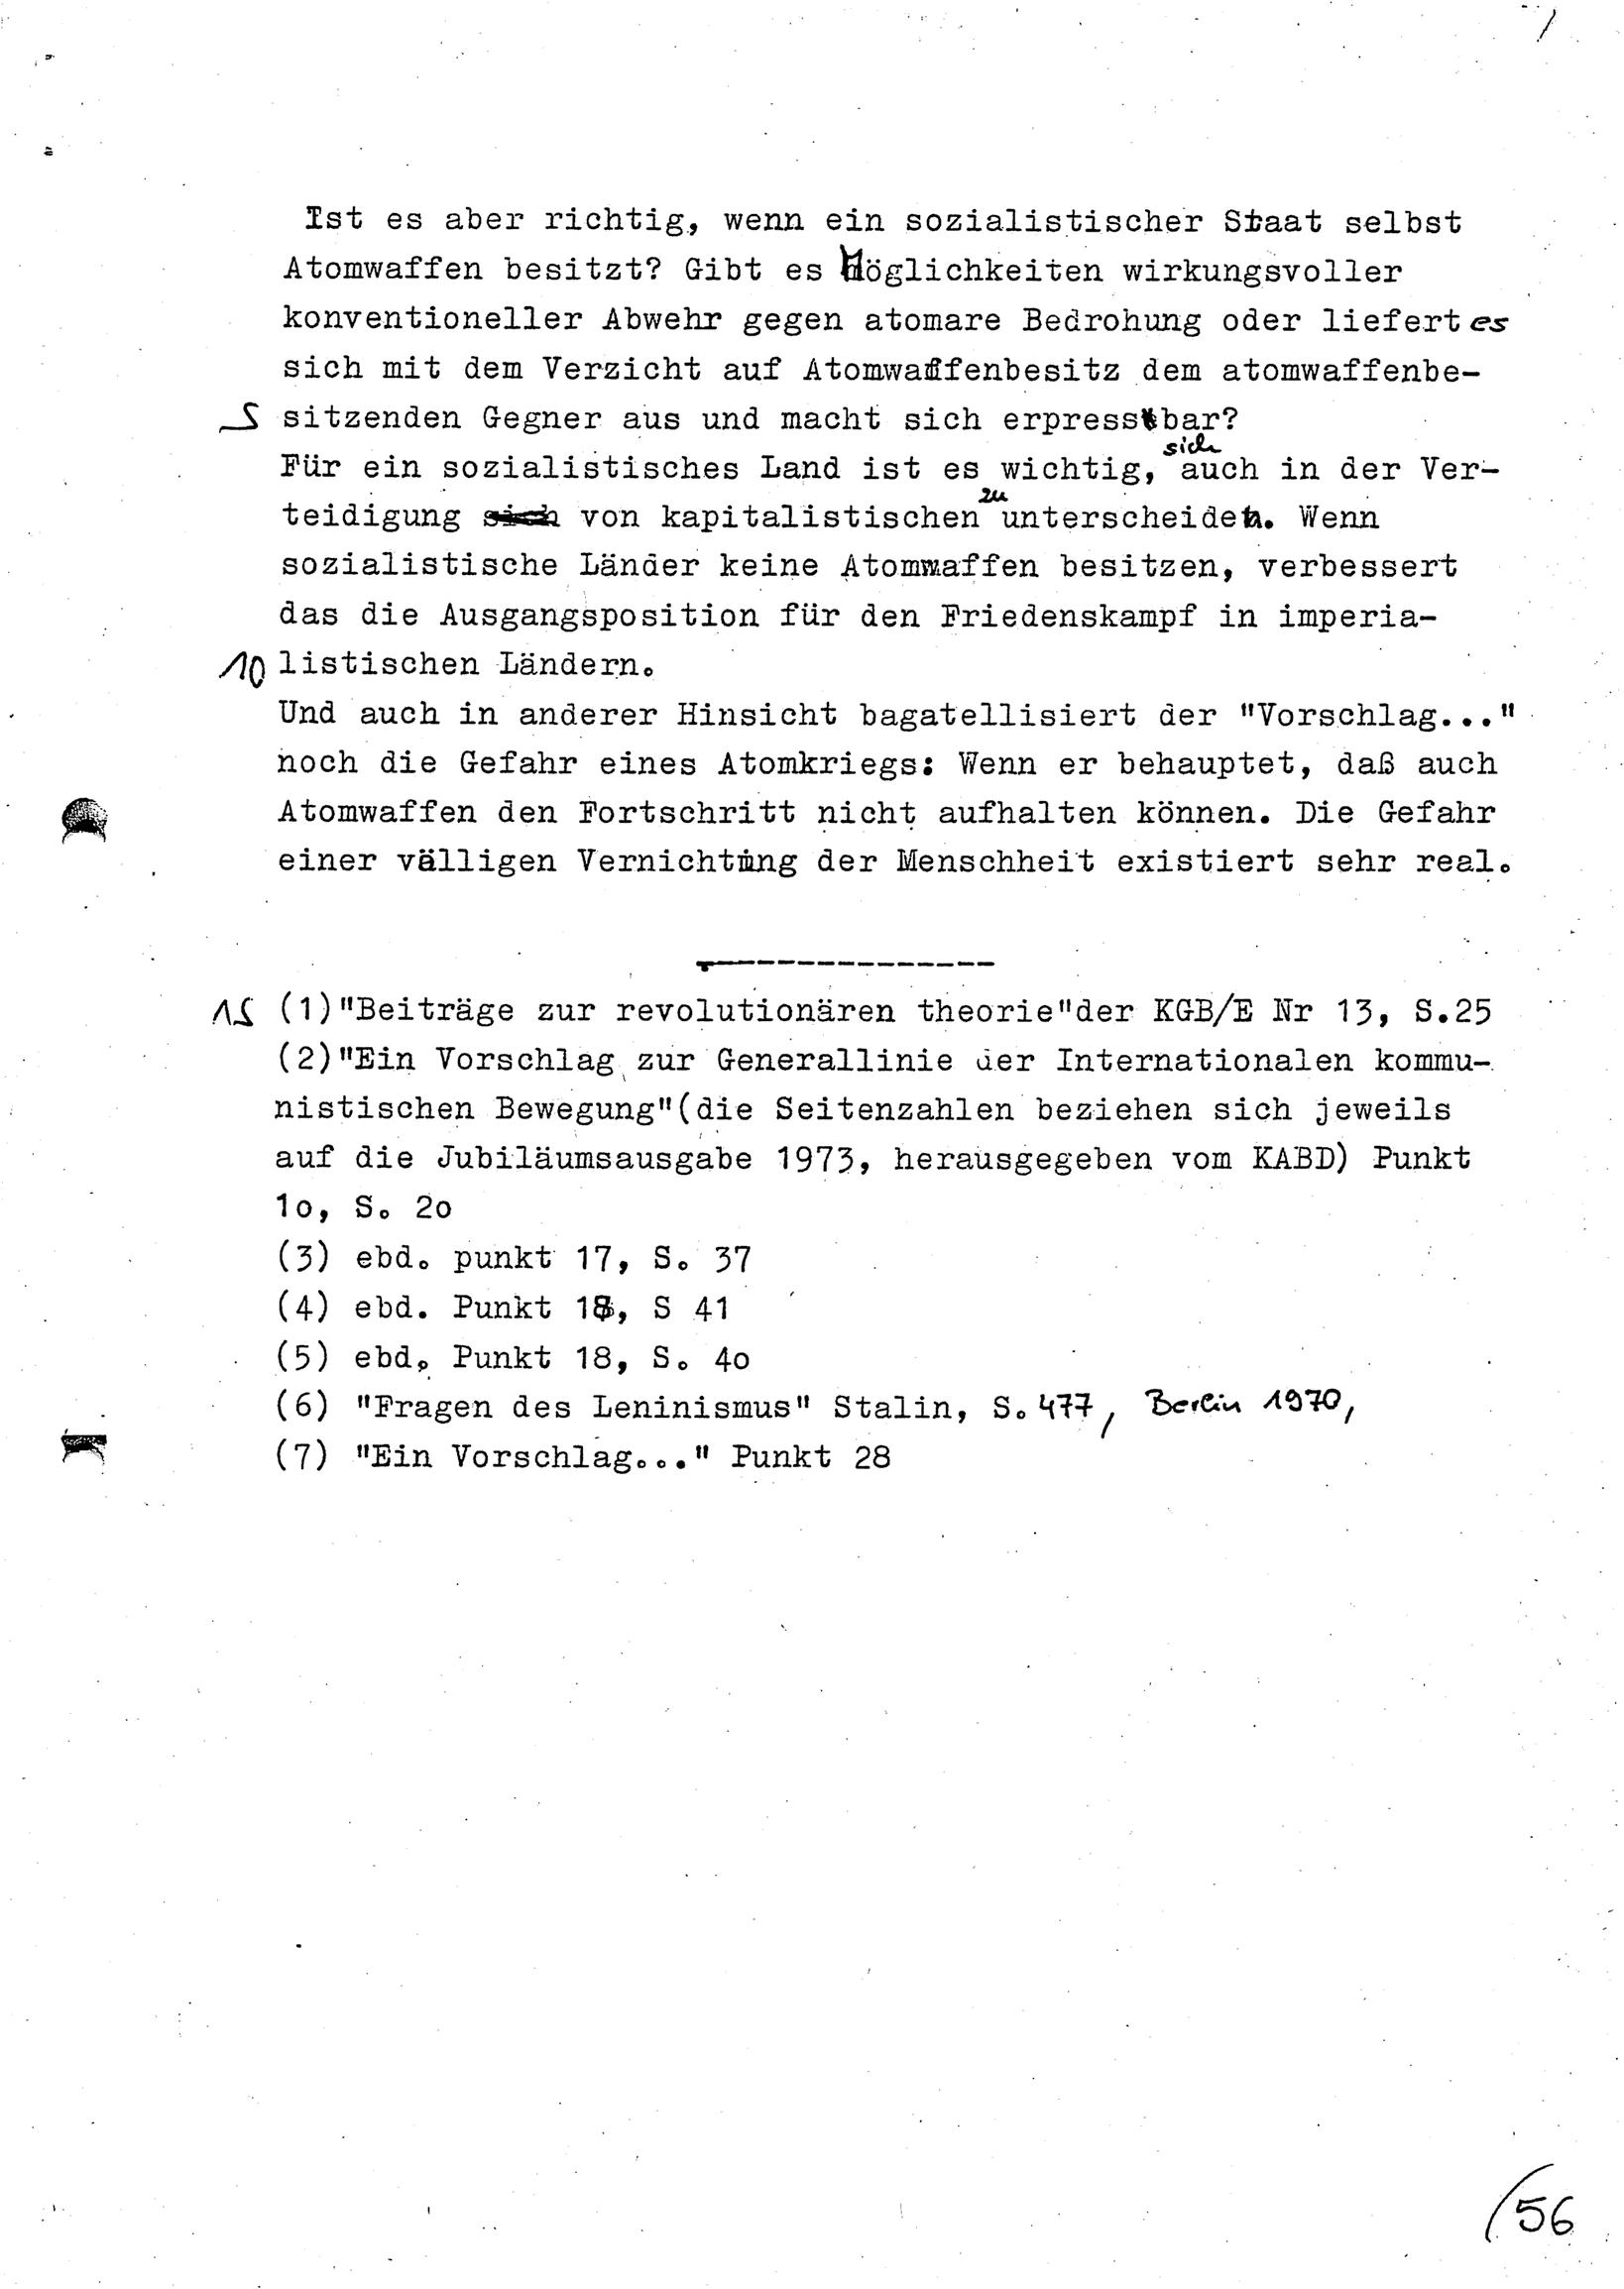 Ulm_KGU_Arbeitsheft_19830425_015_059